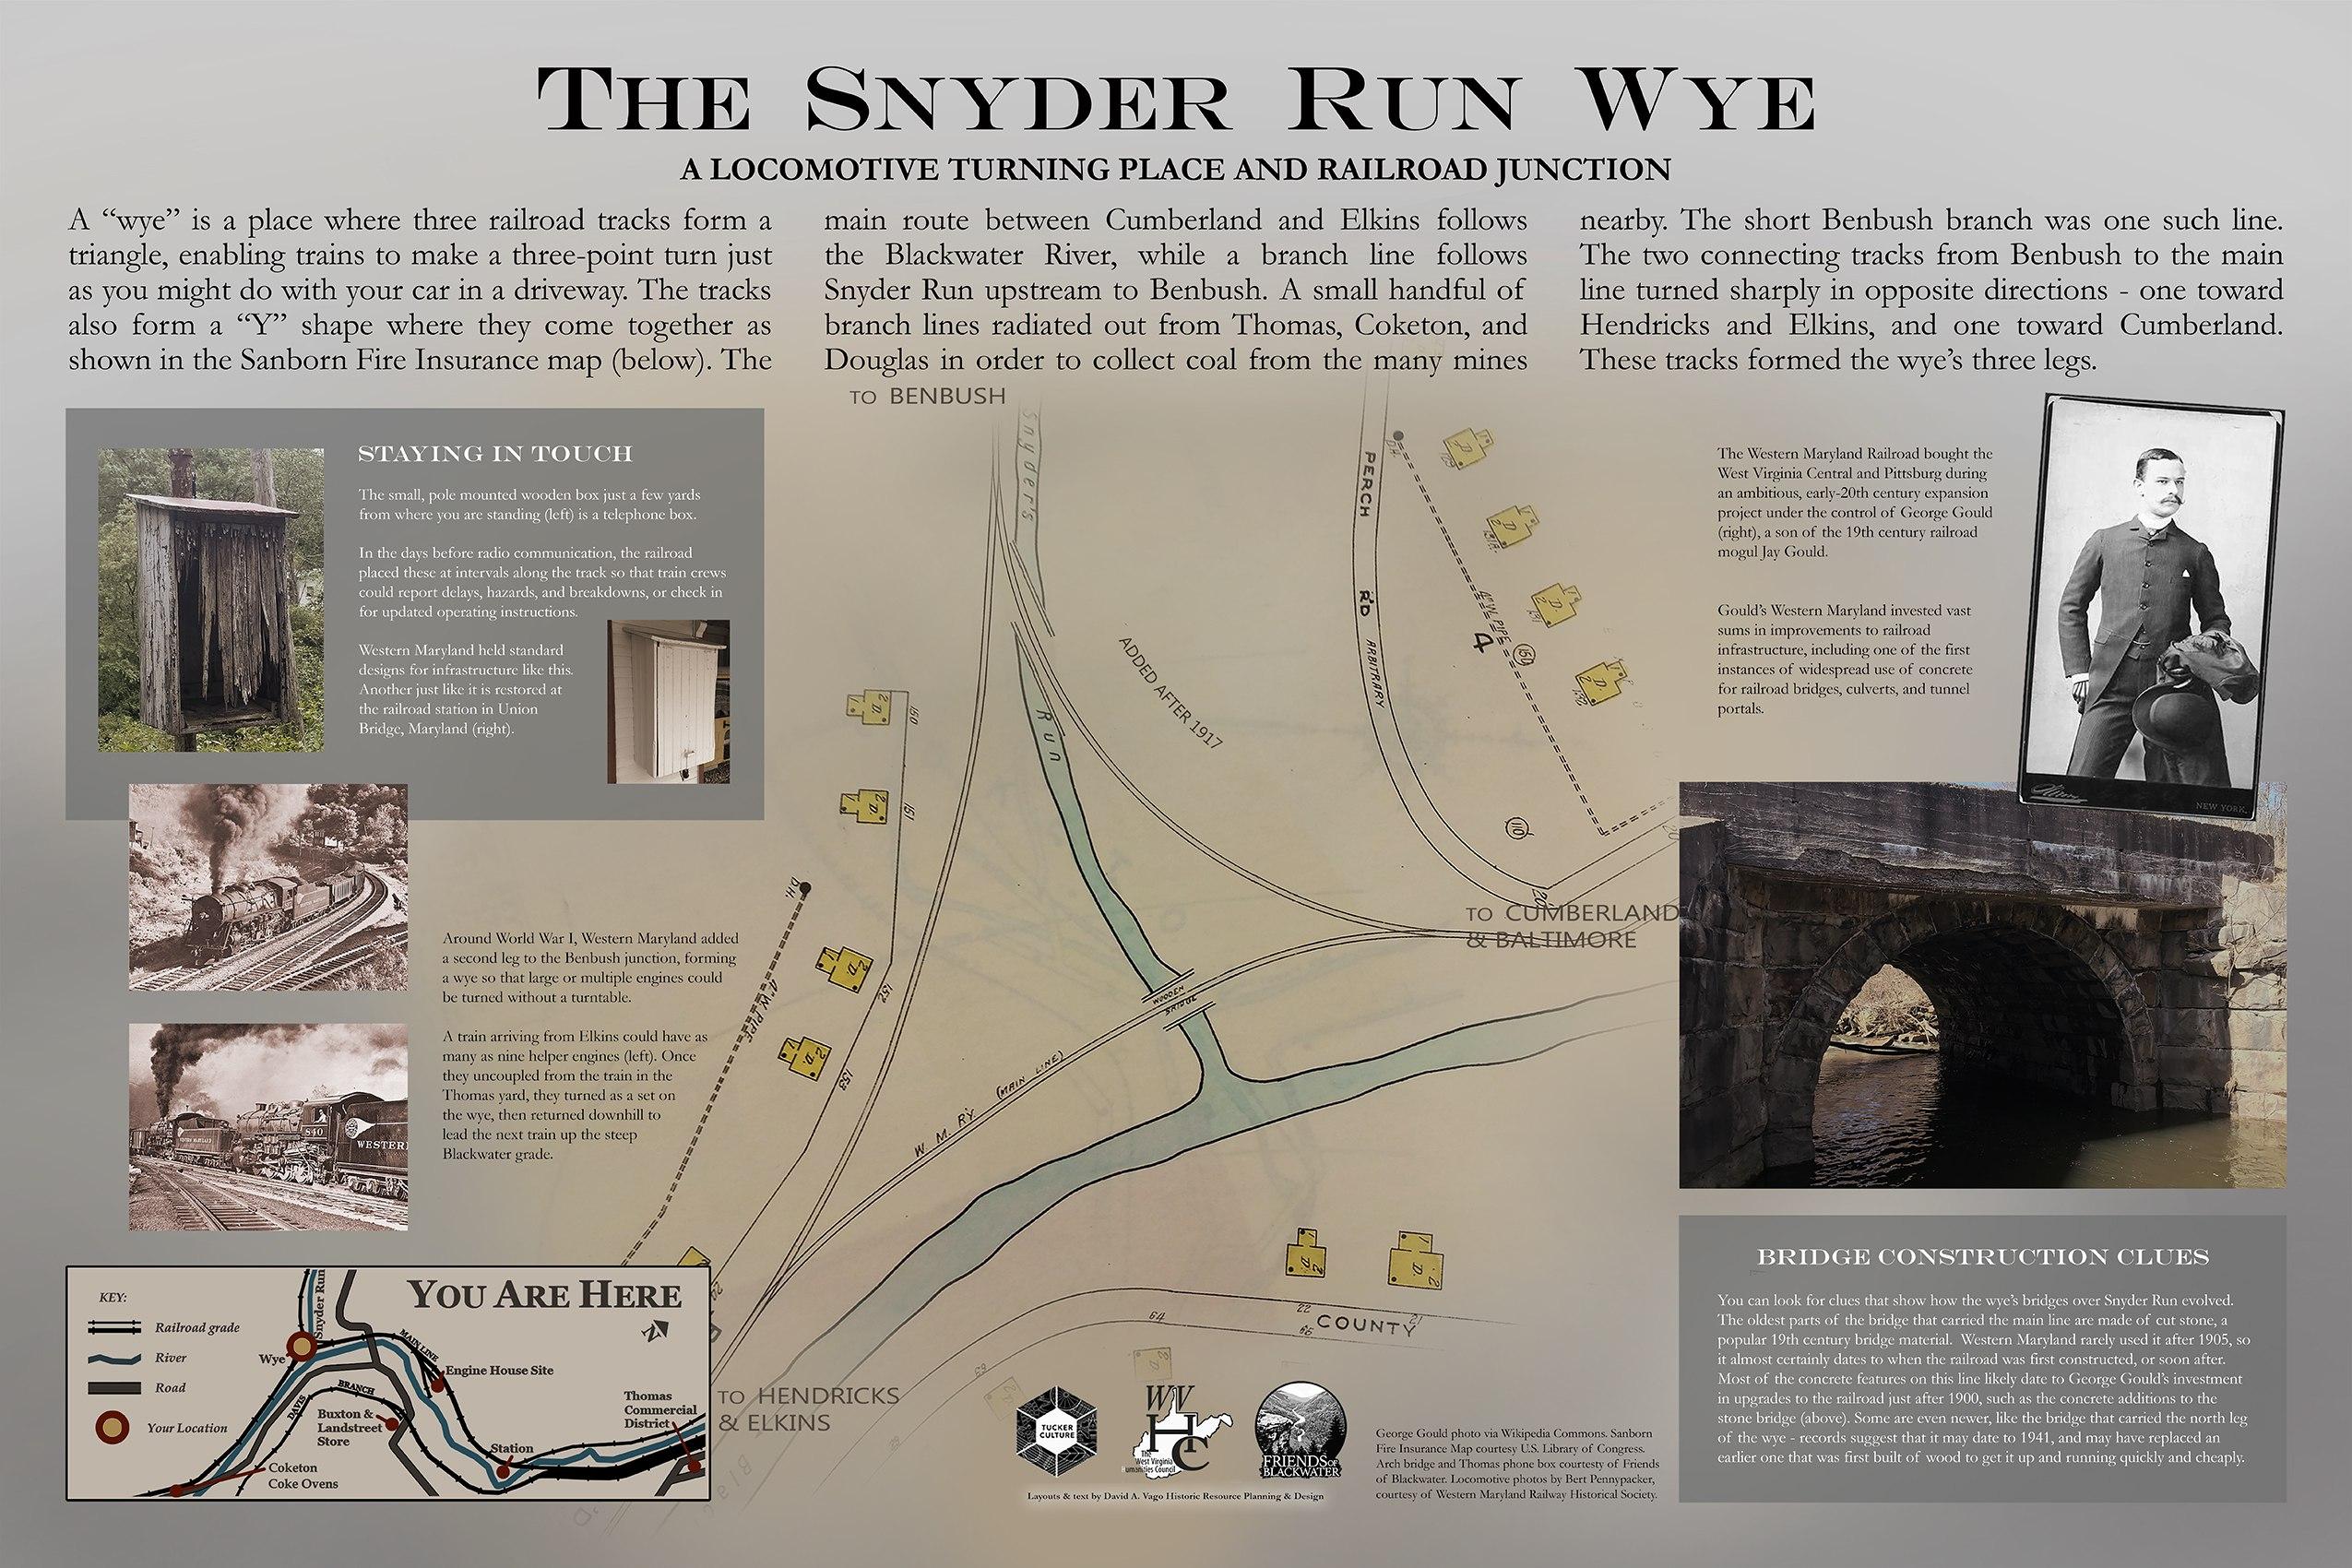 Snyder-Run-Panel-2018-05-12-small